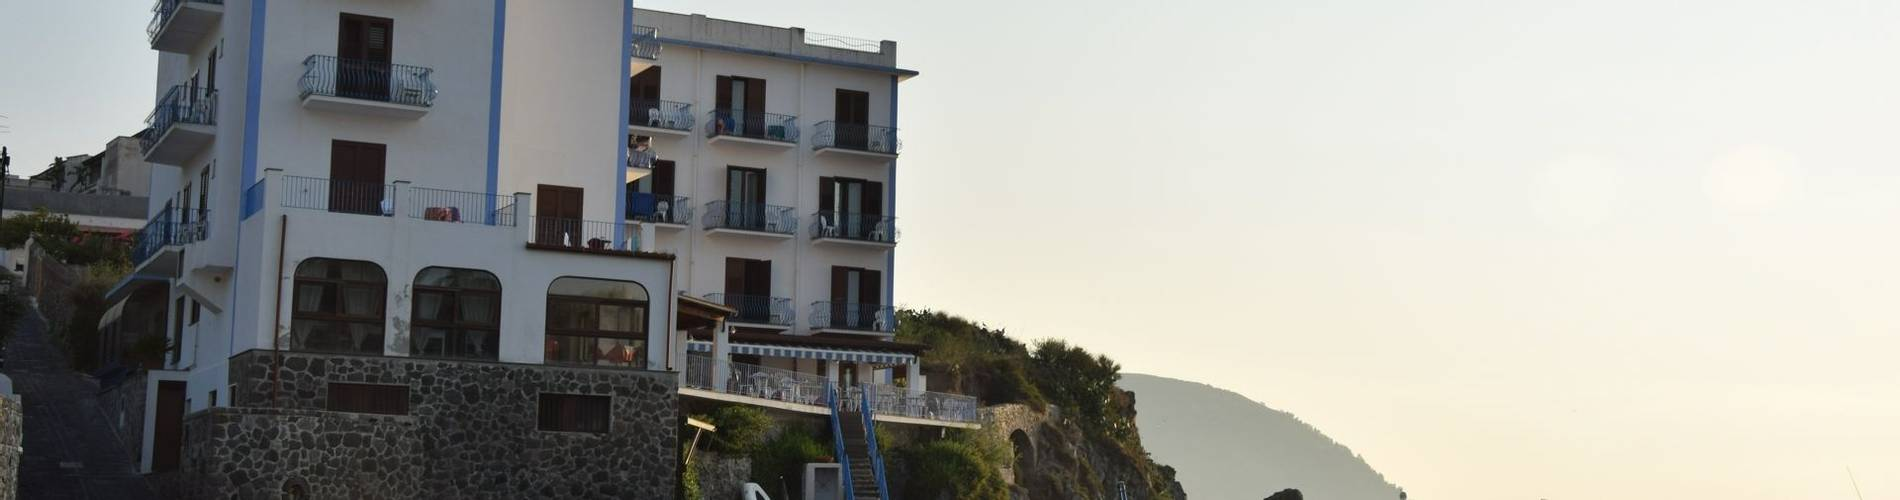 Rocce Azzurre, Sicily, Italy (9).JPG